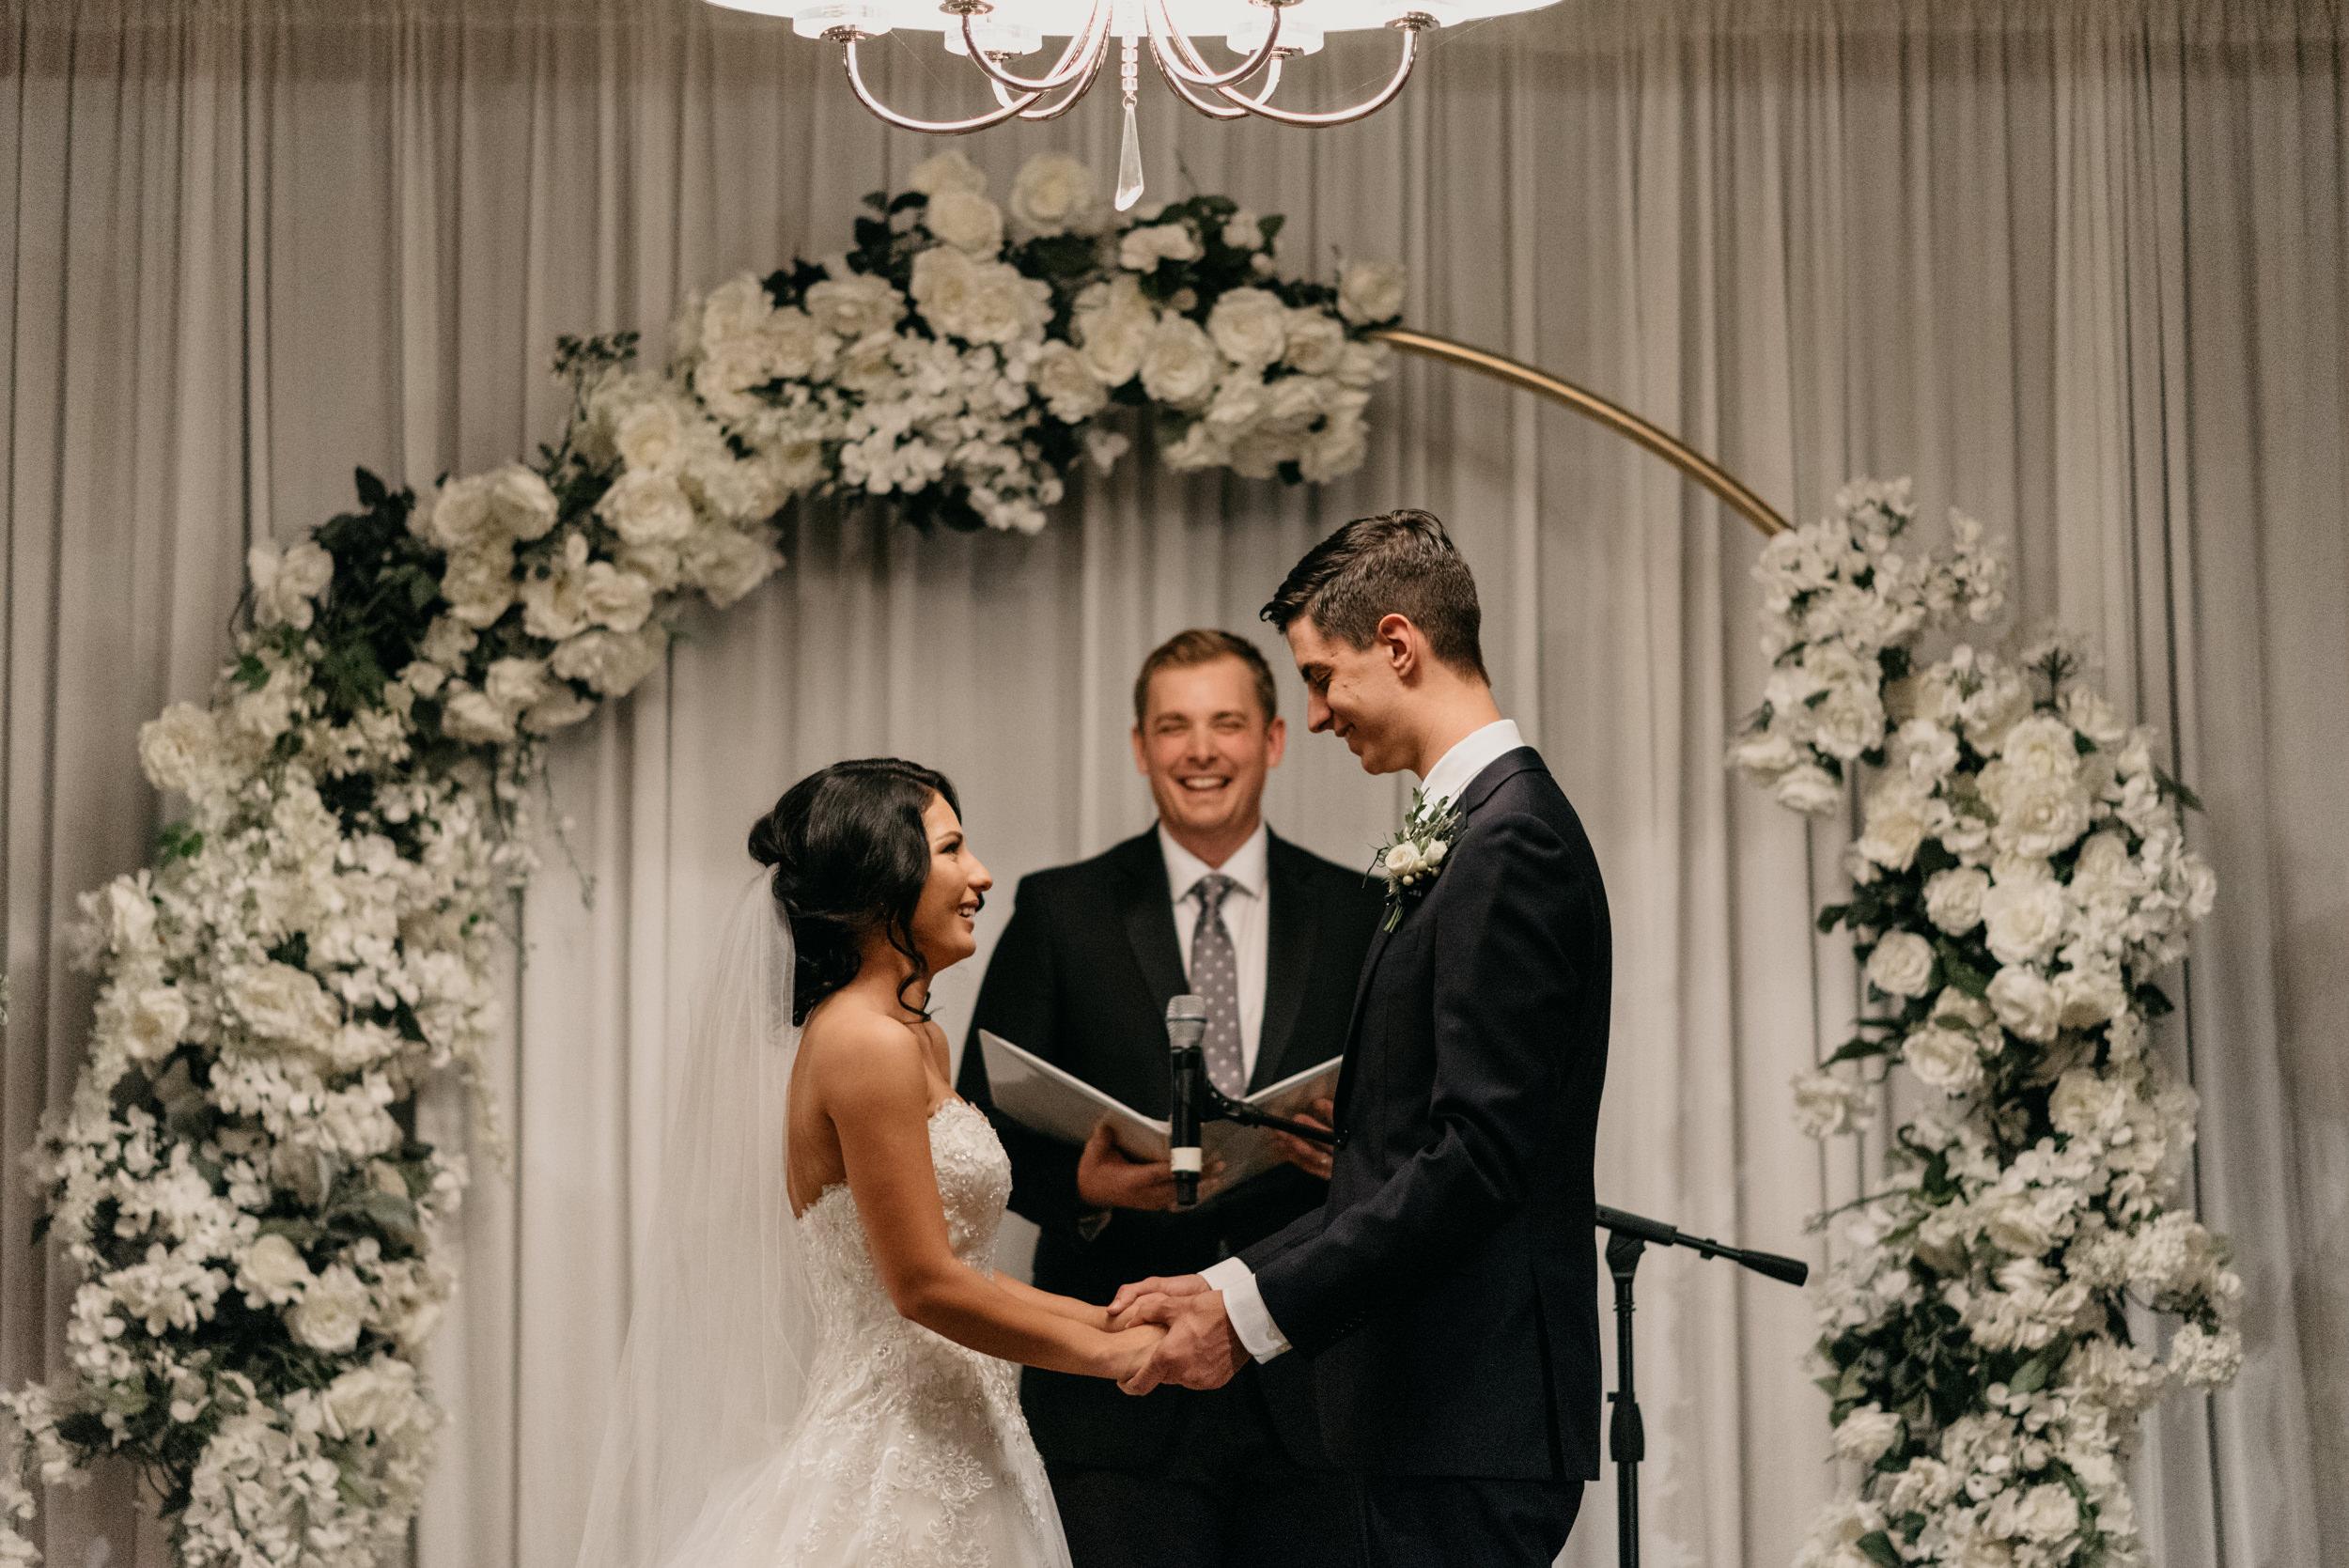 82-ceremony-west-end-ballroom-portland-wedding-venue-9186.jpg